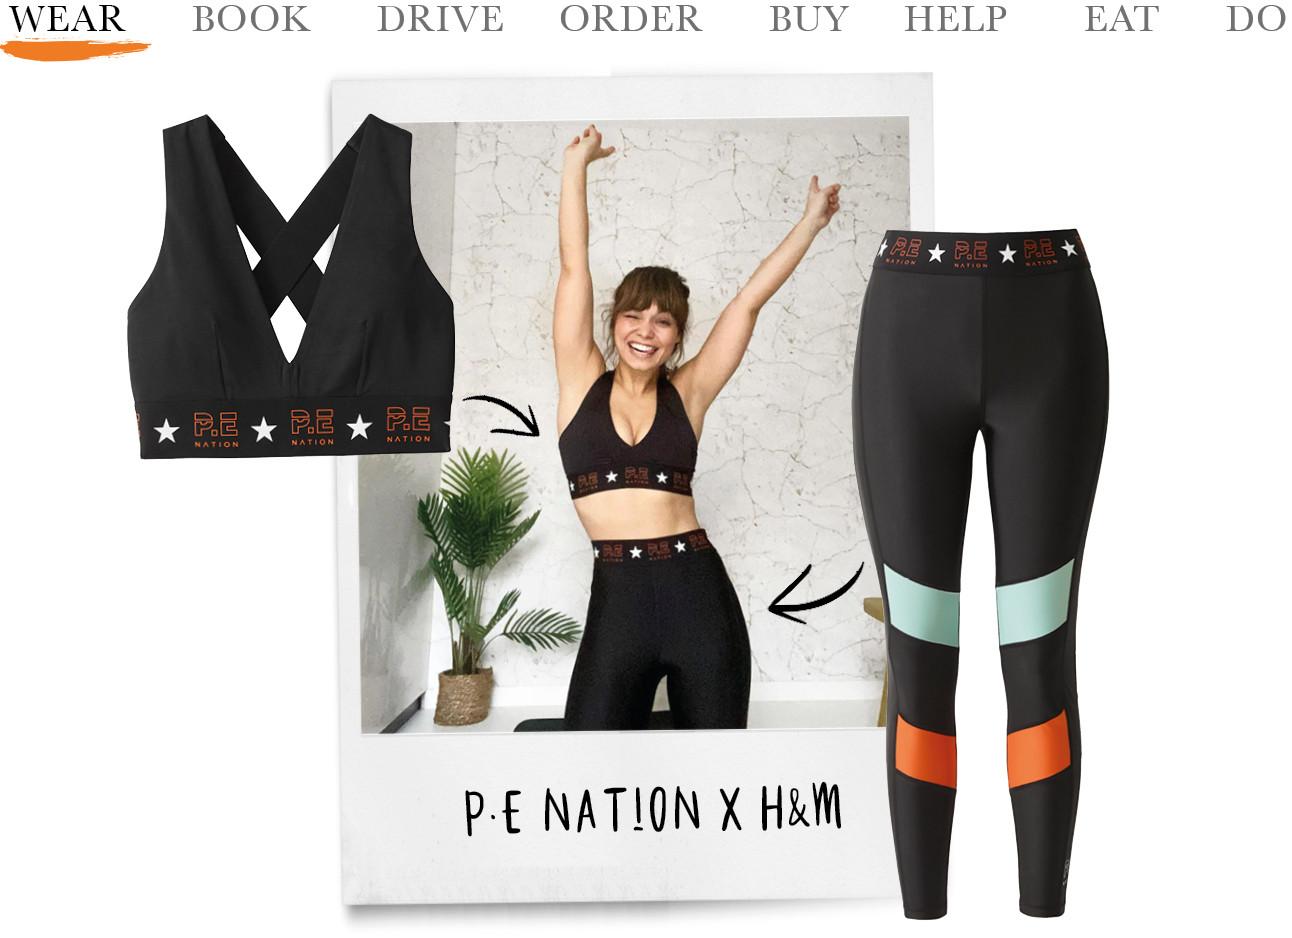 kiki draag nieuwe collectie van H&M Wear x PE Nation